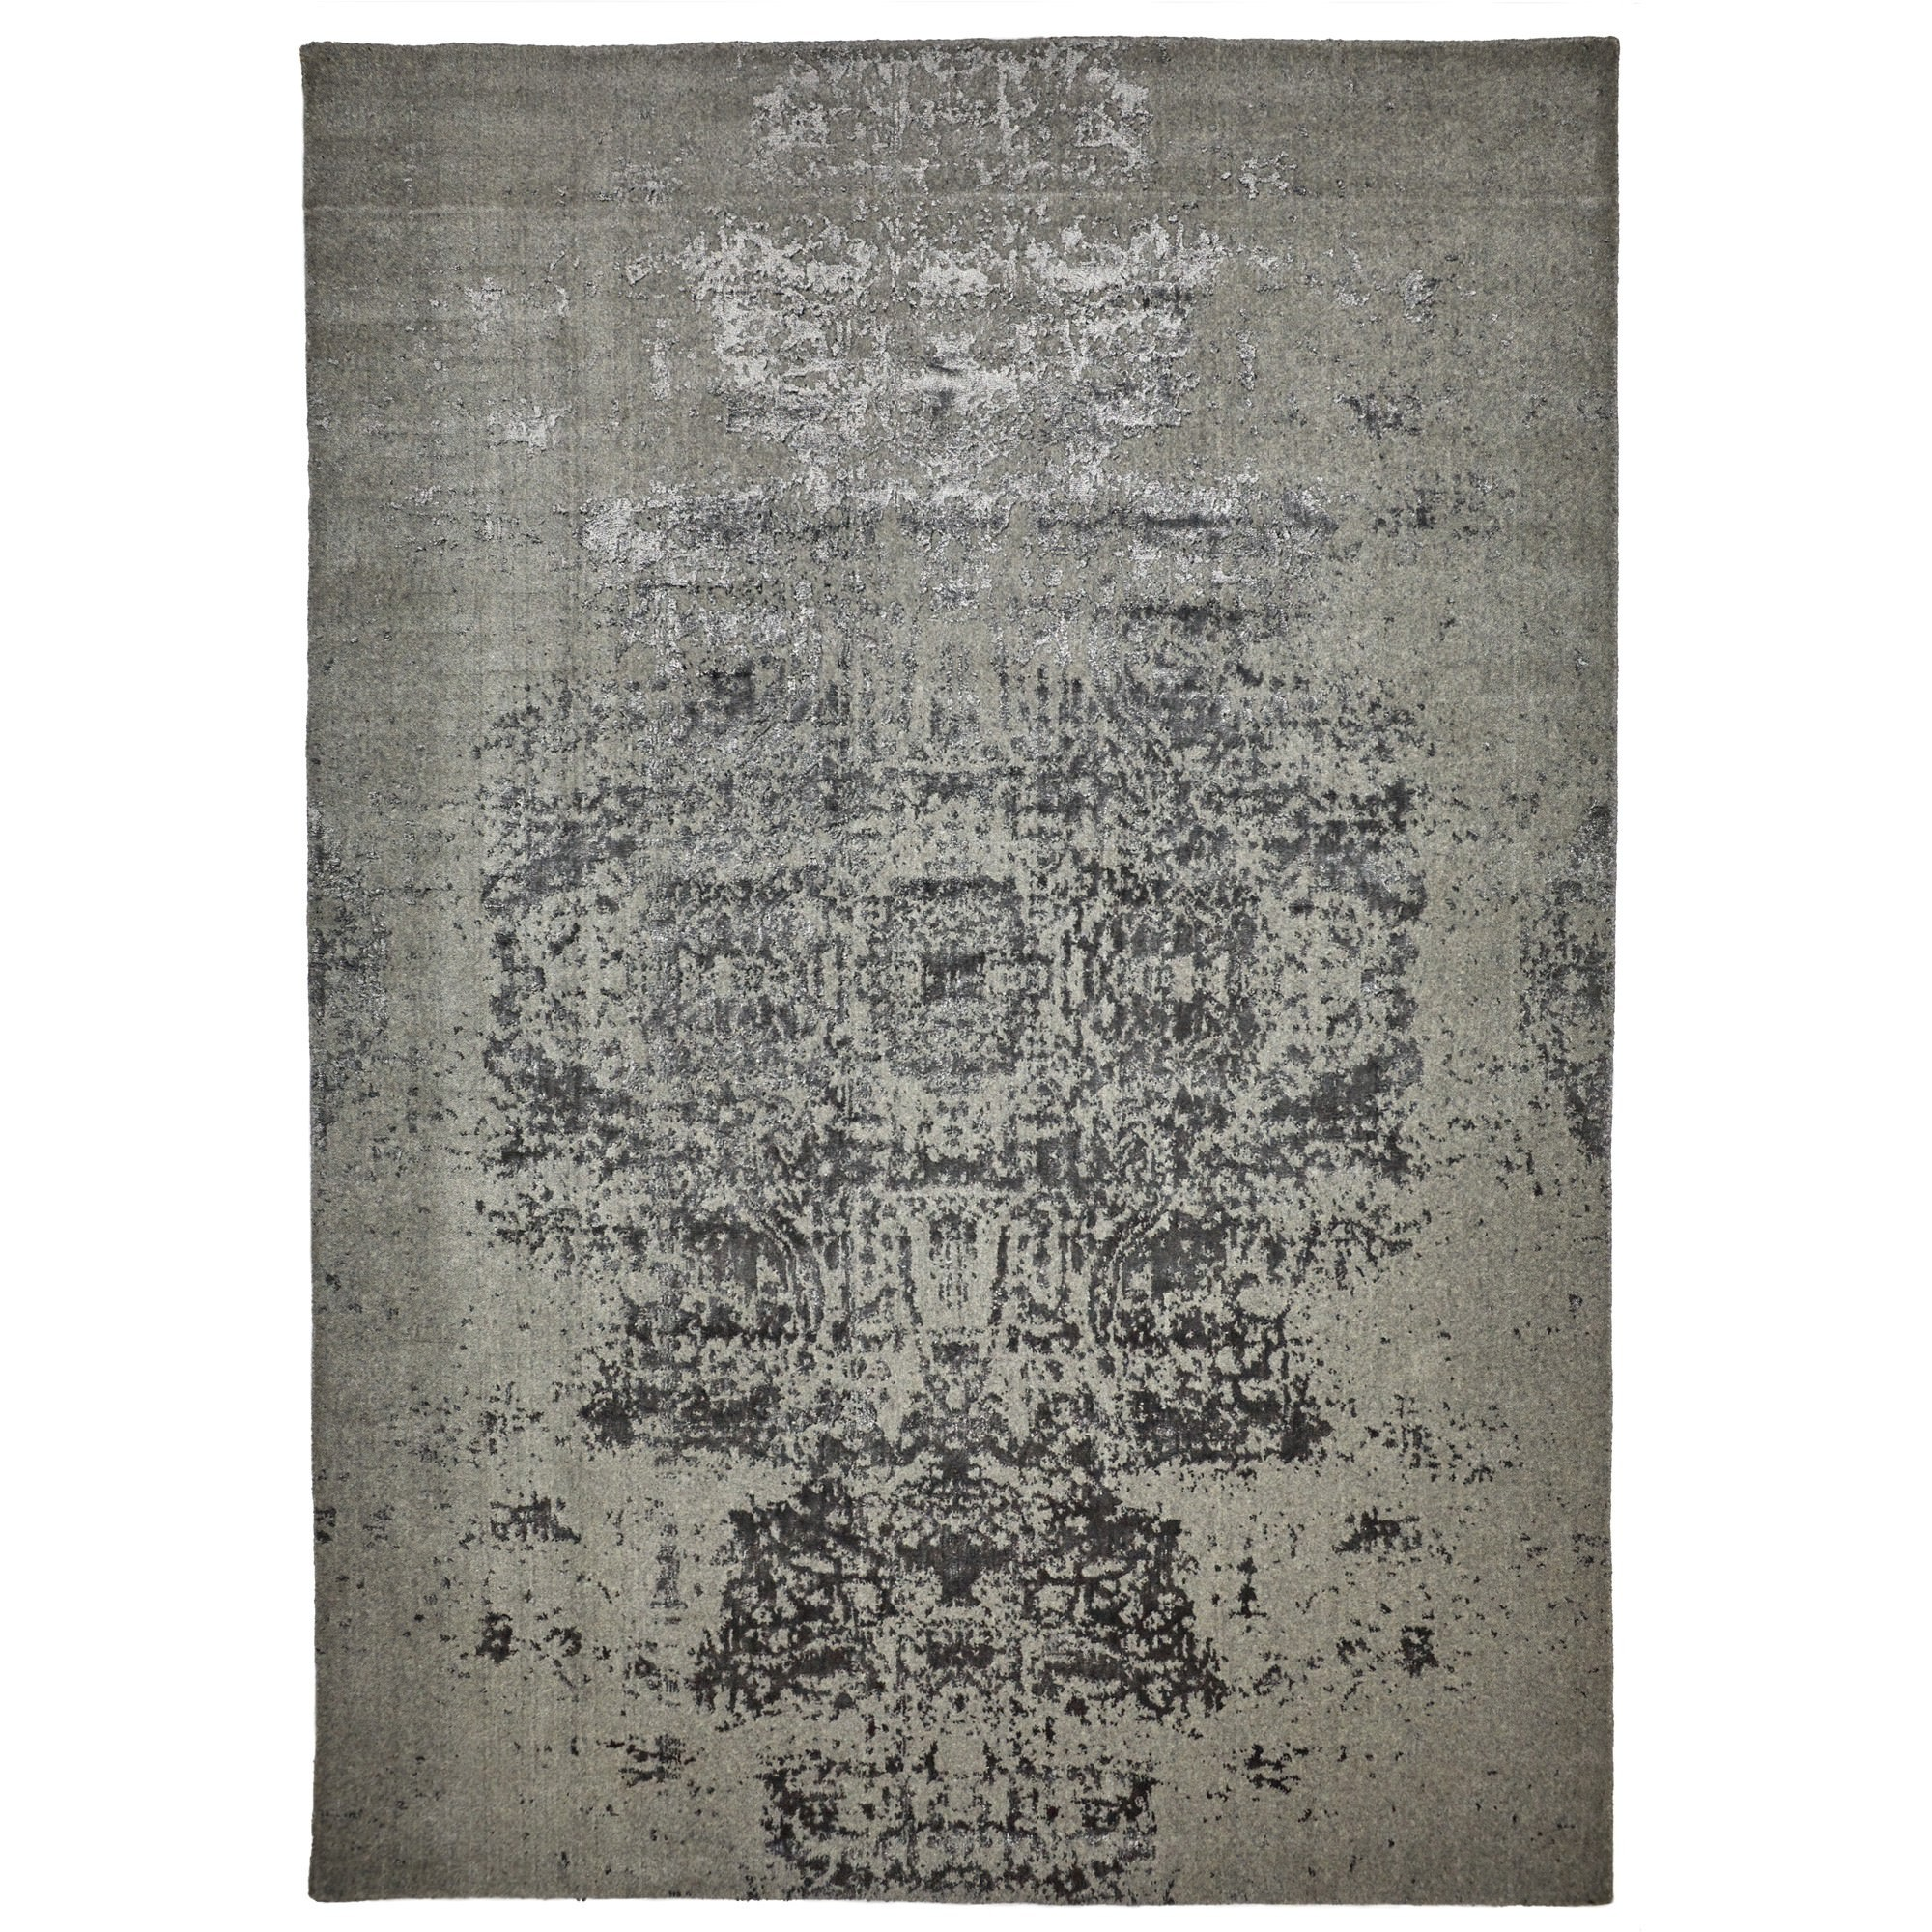 Vienna No.047 Handmade Wool Transitional Rug, 160x110cm, Grey